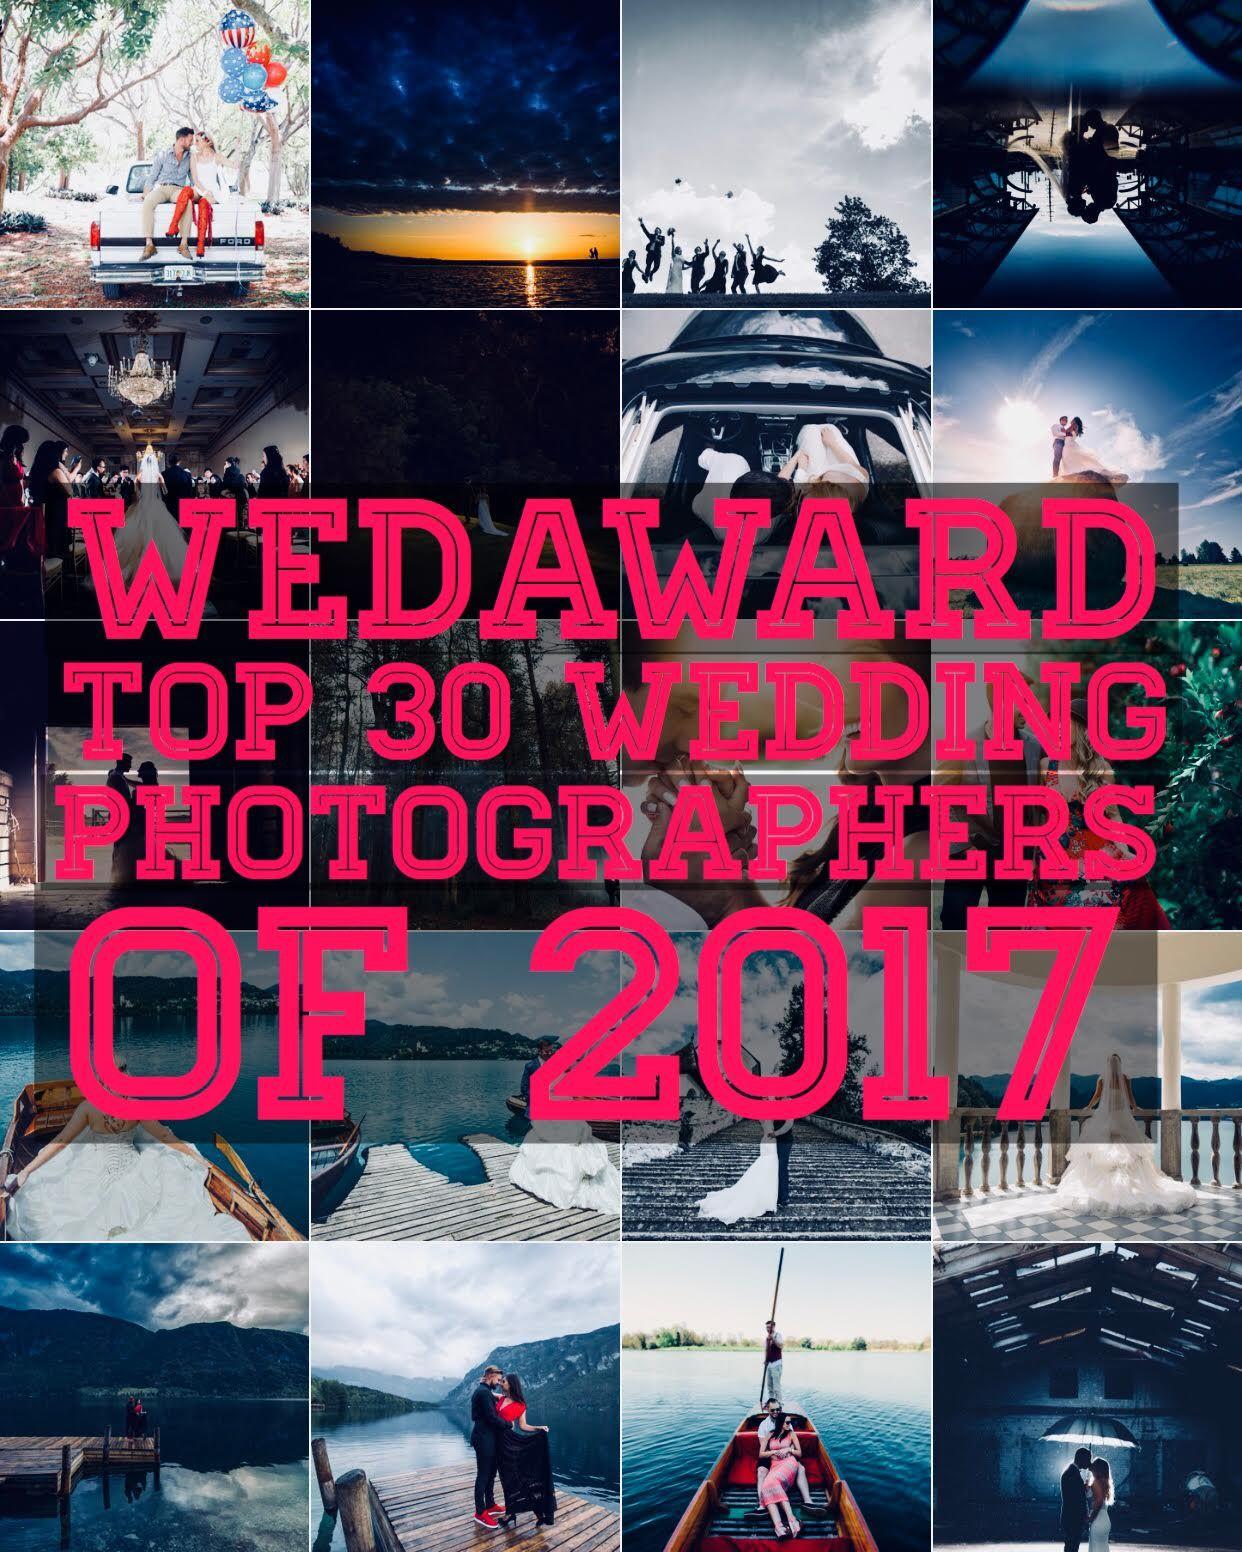 WedAward Top 30 Photographer